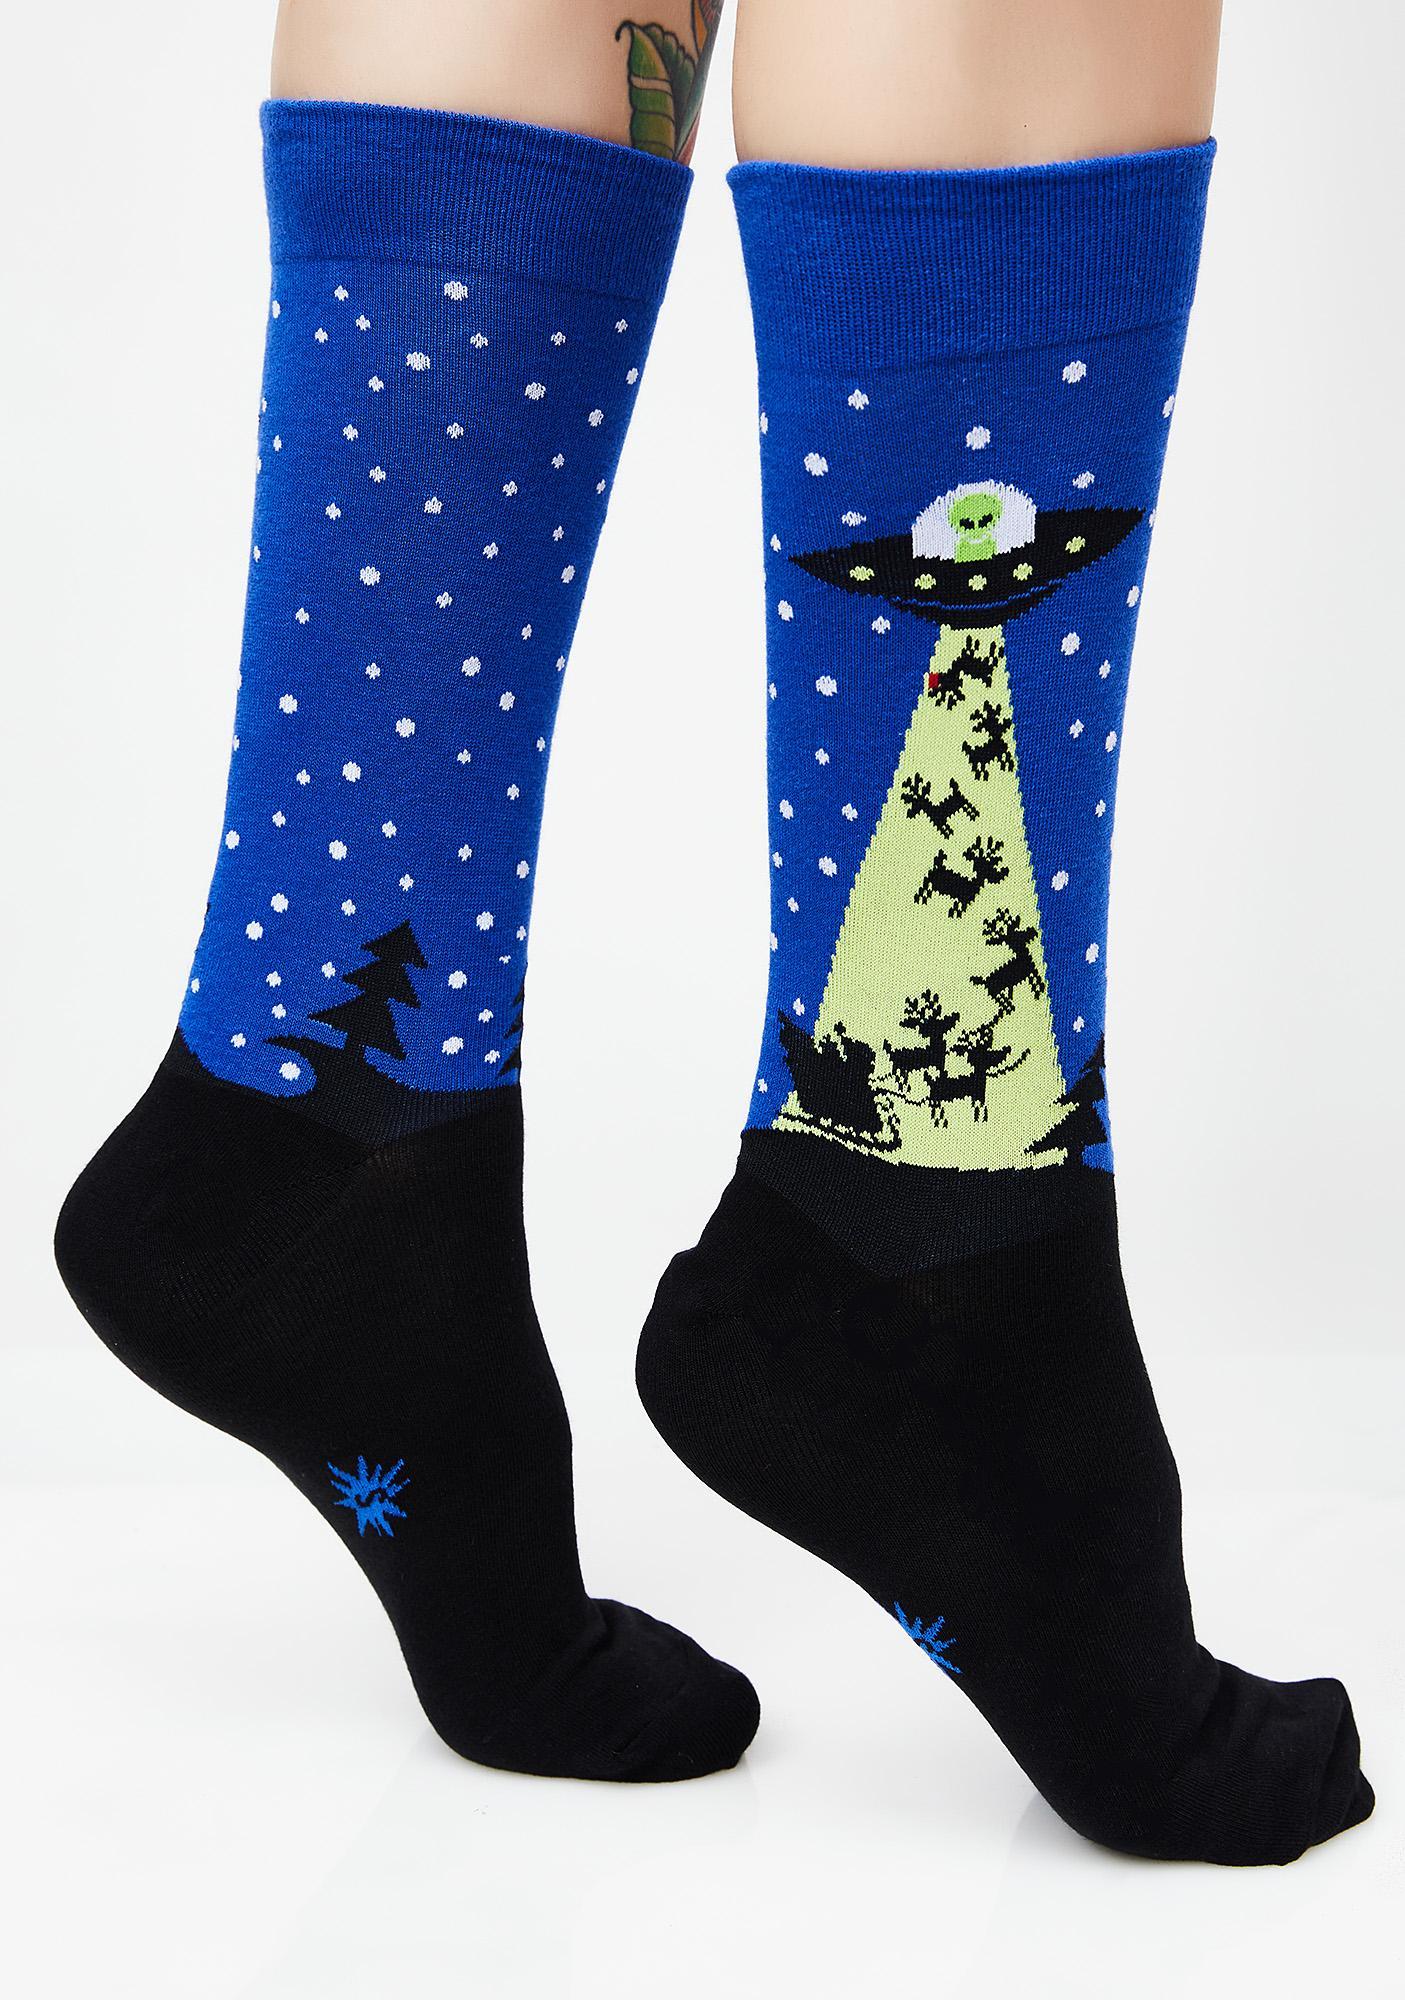 Stealin' Xmas Socks